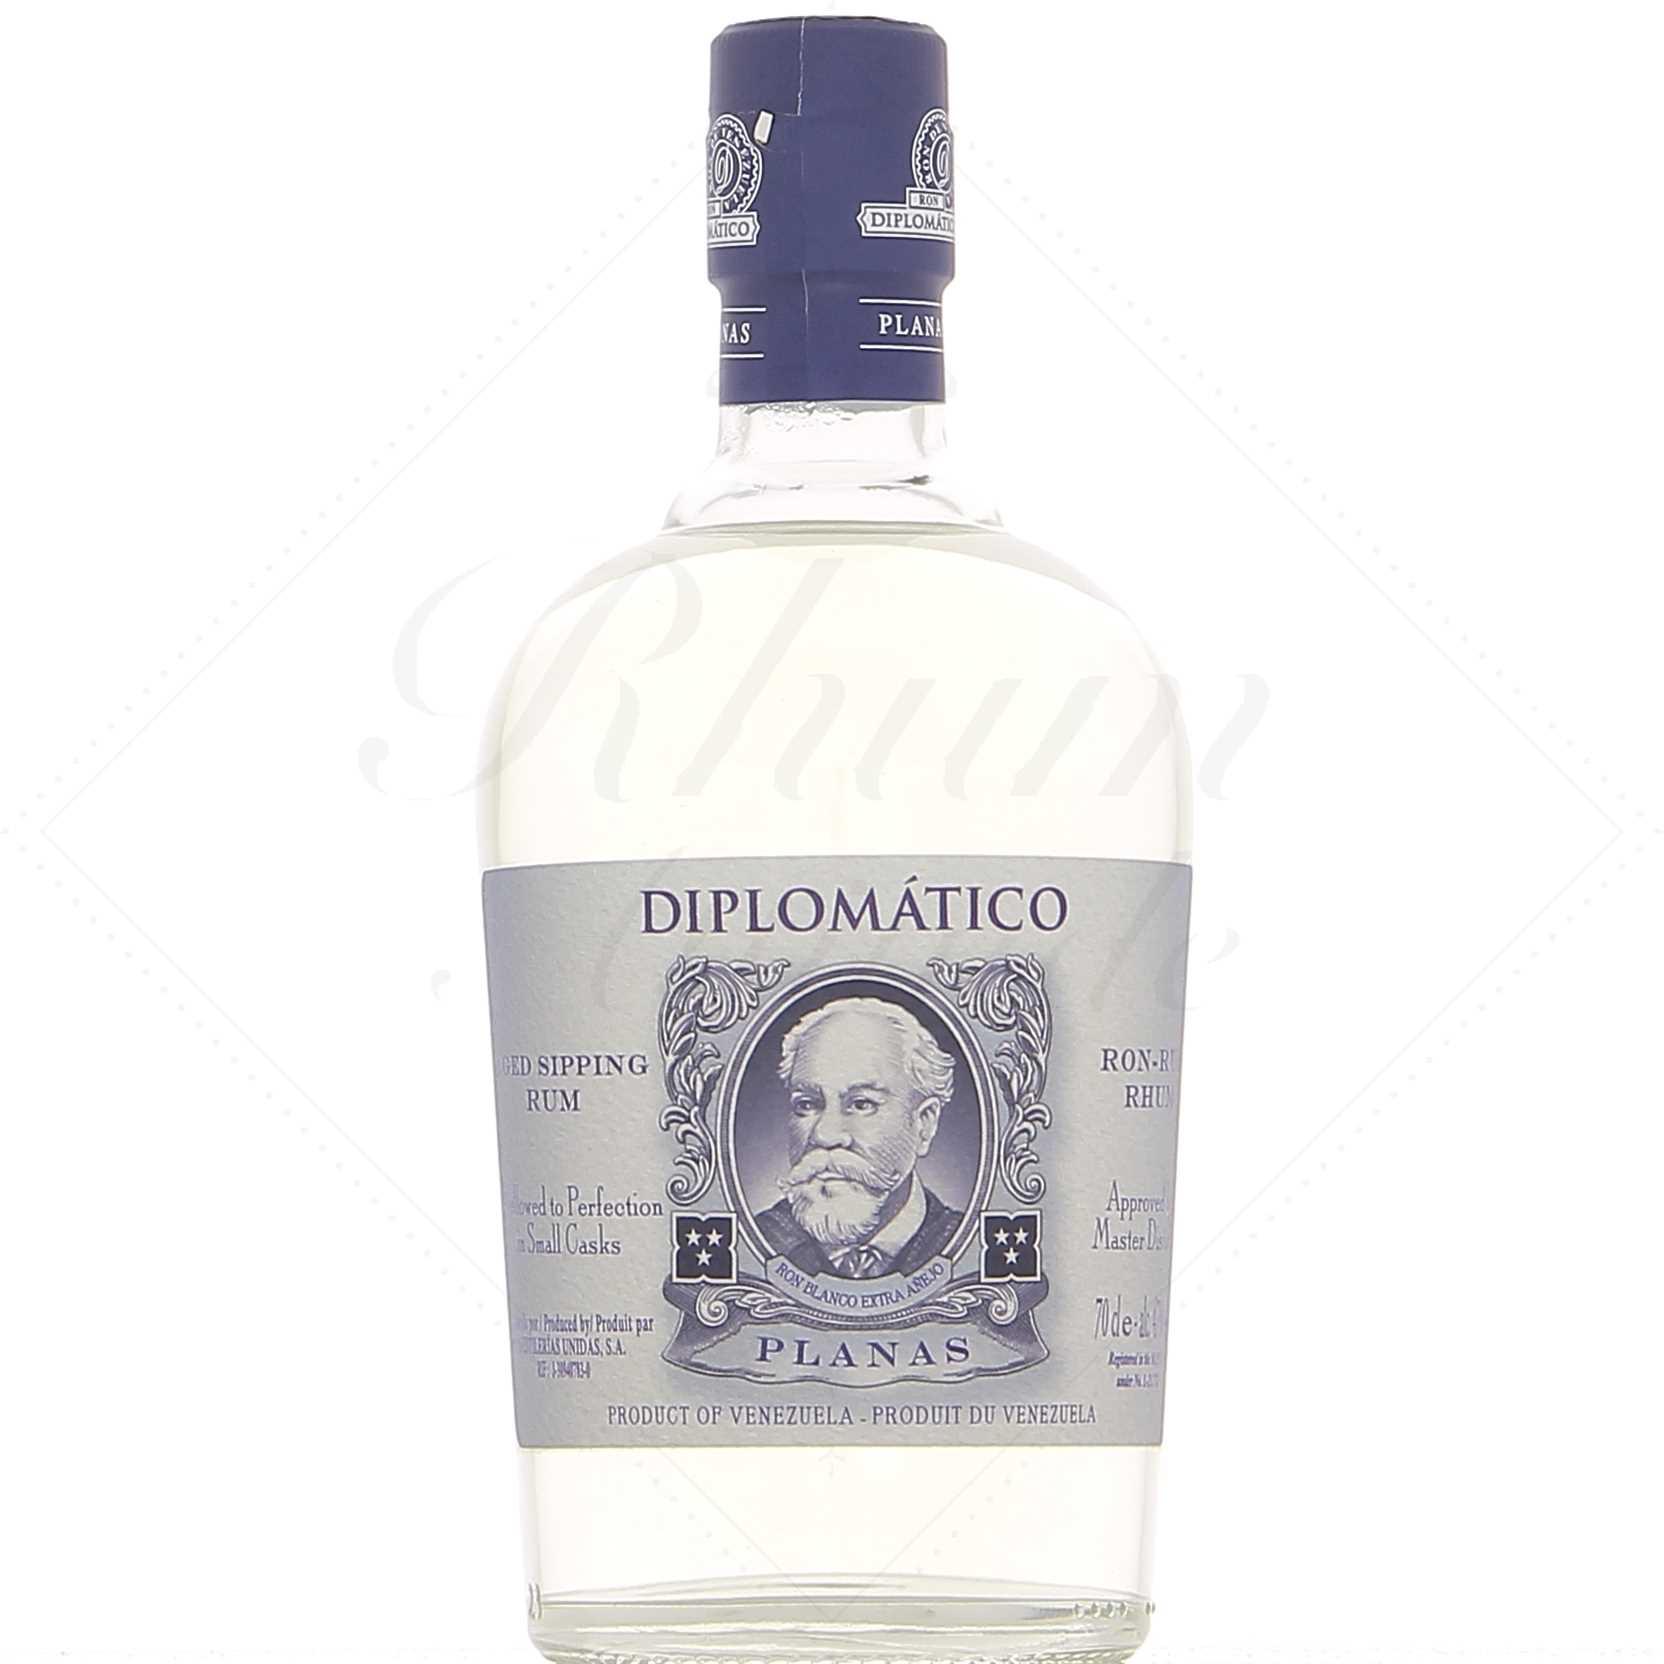 Diplomatico blanc